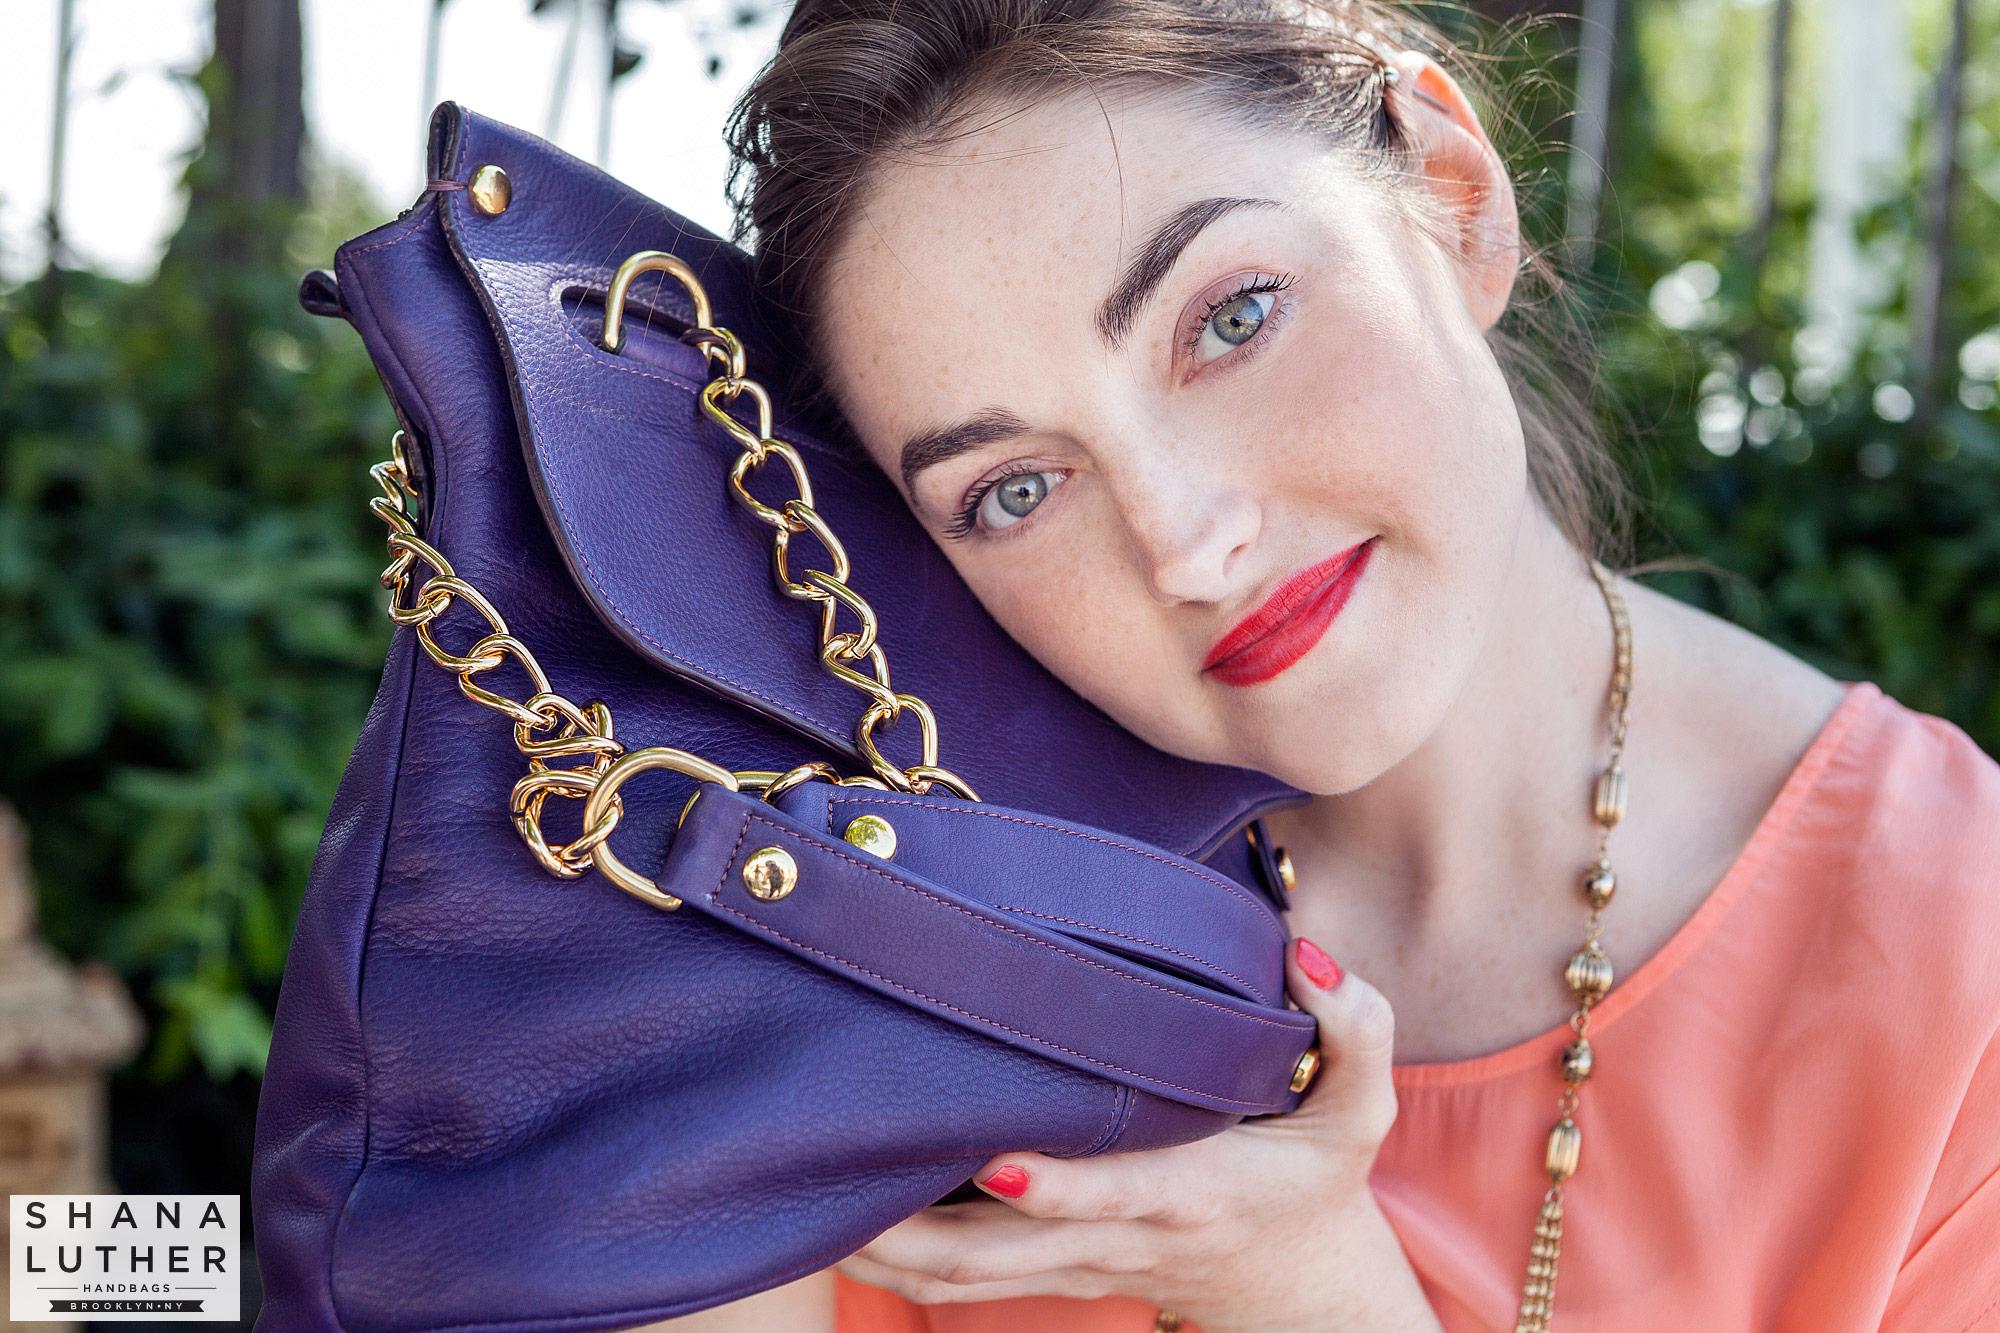 Carey_Kirkella_fashion_120512_shana_handbags_6038.jpg